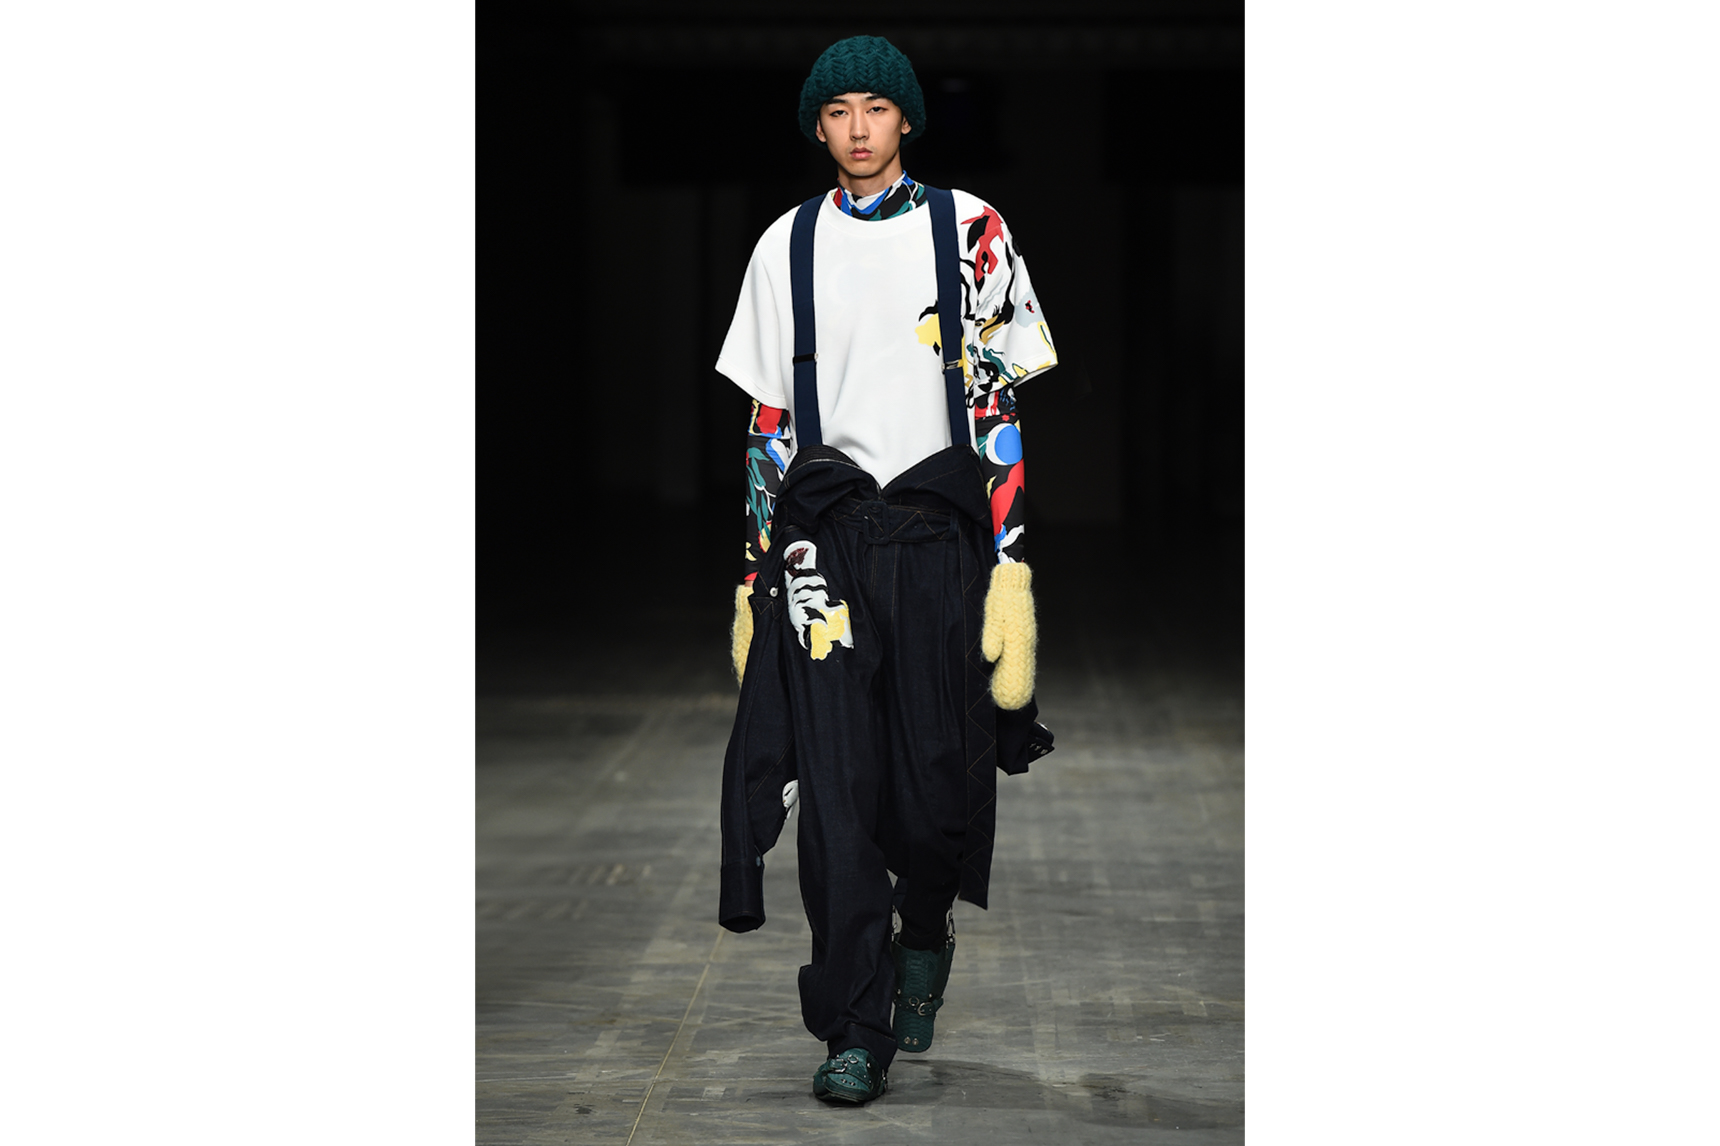 Angel Chen milano fashion show look 14-Edit.jpg